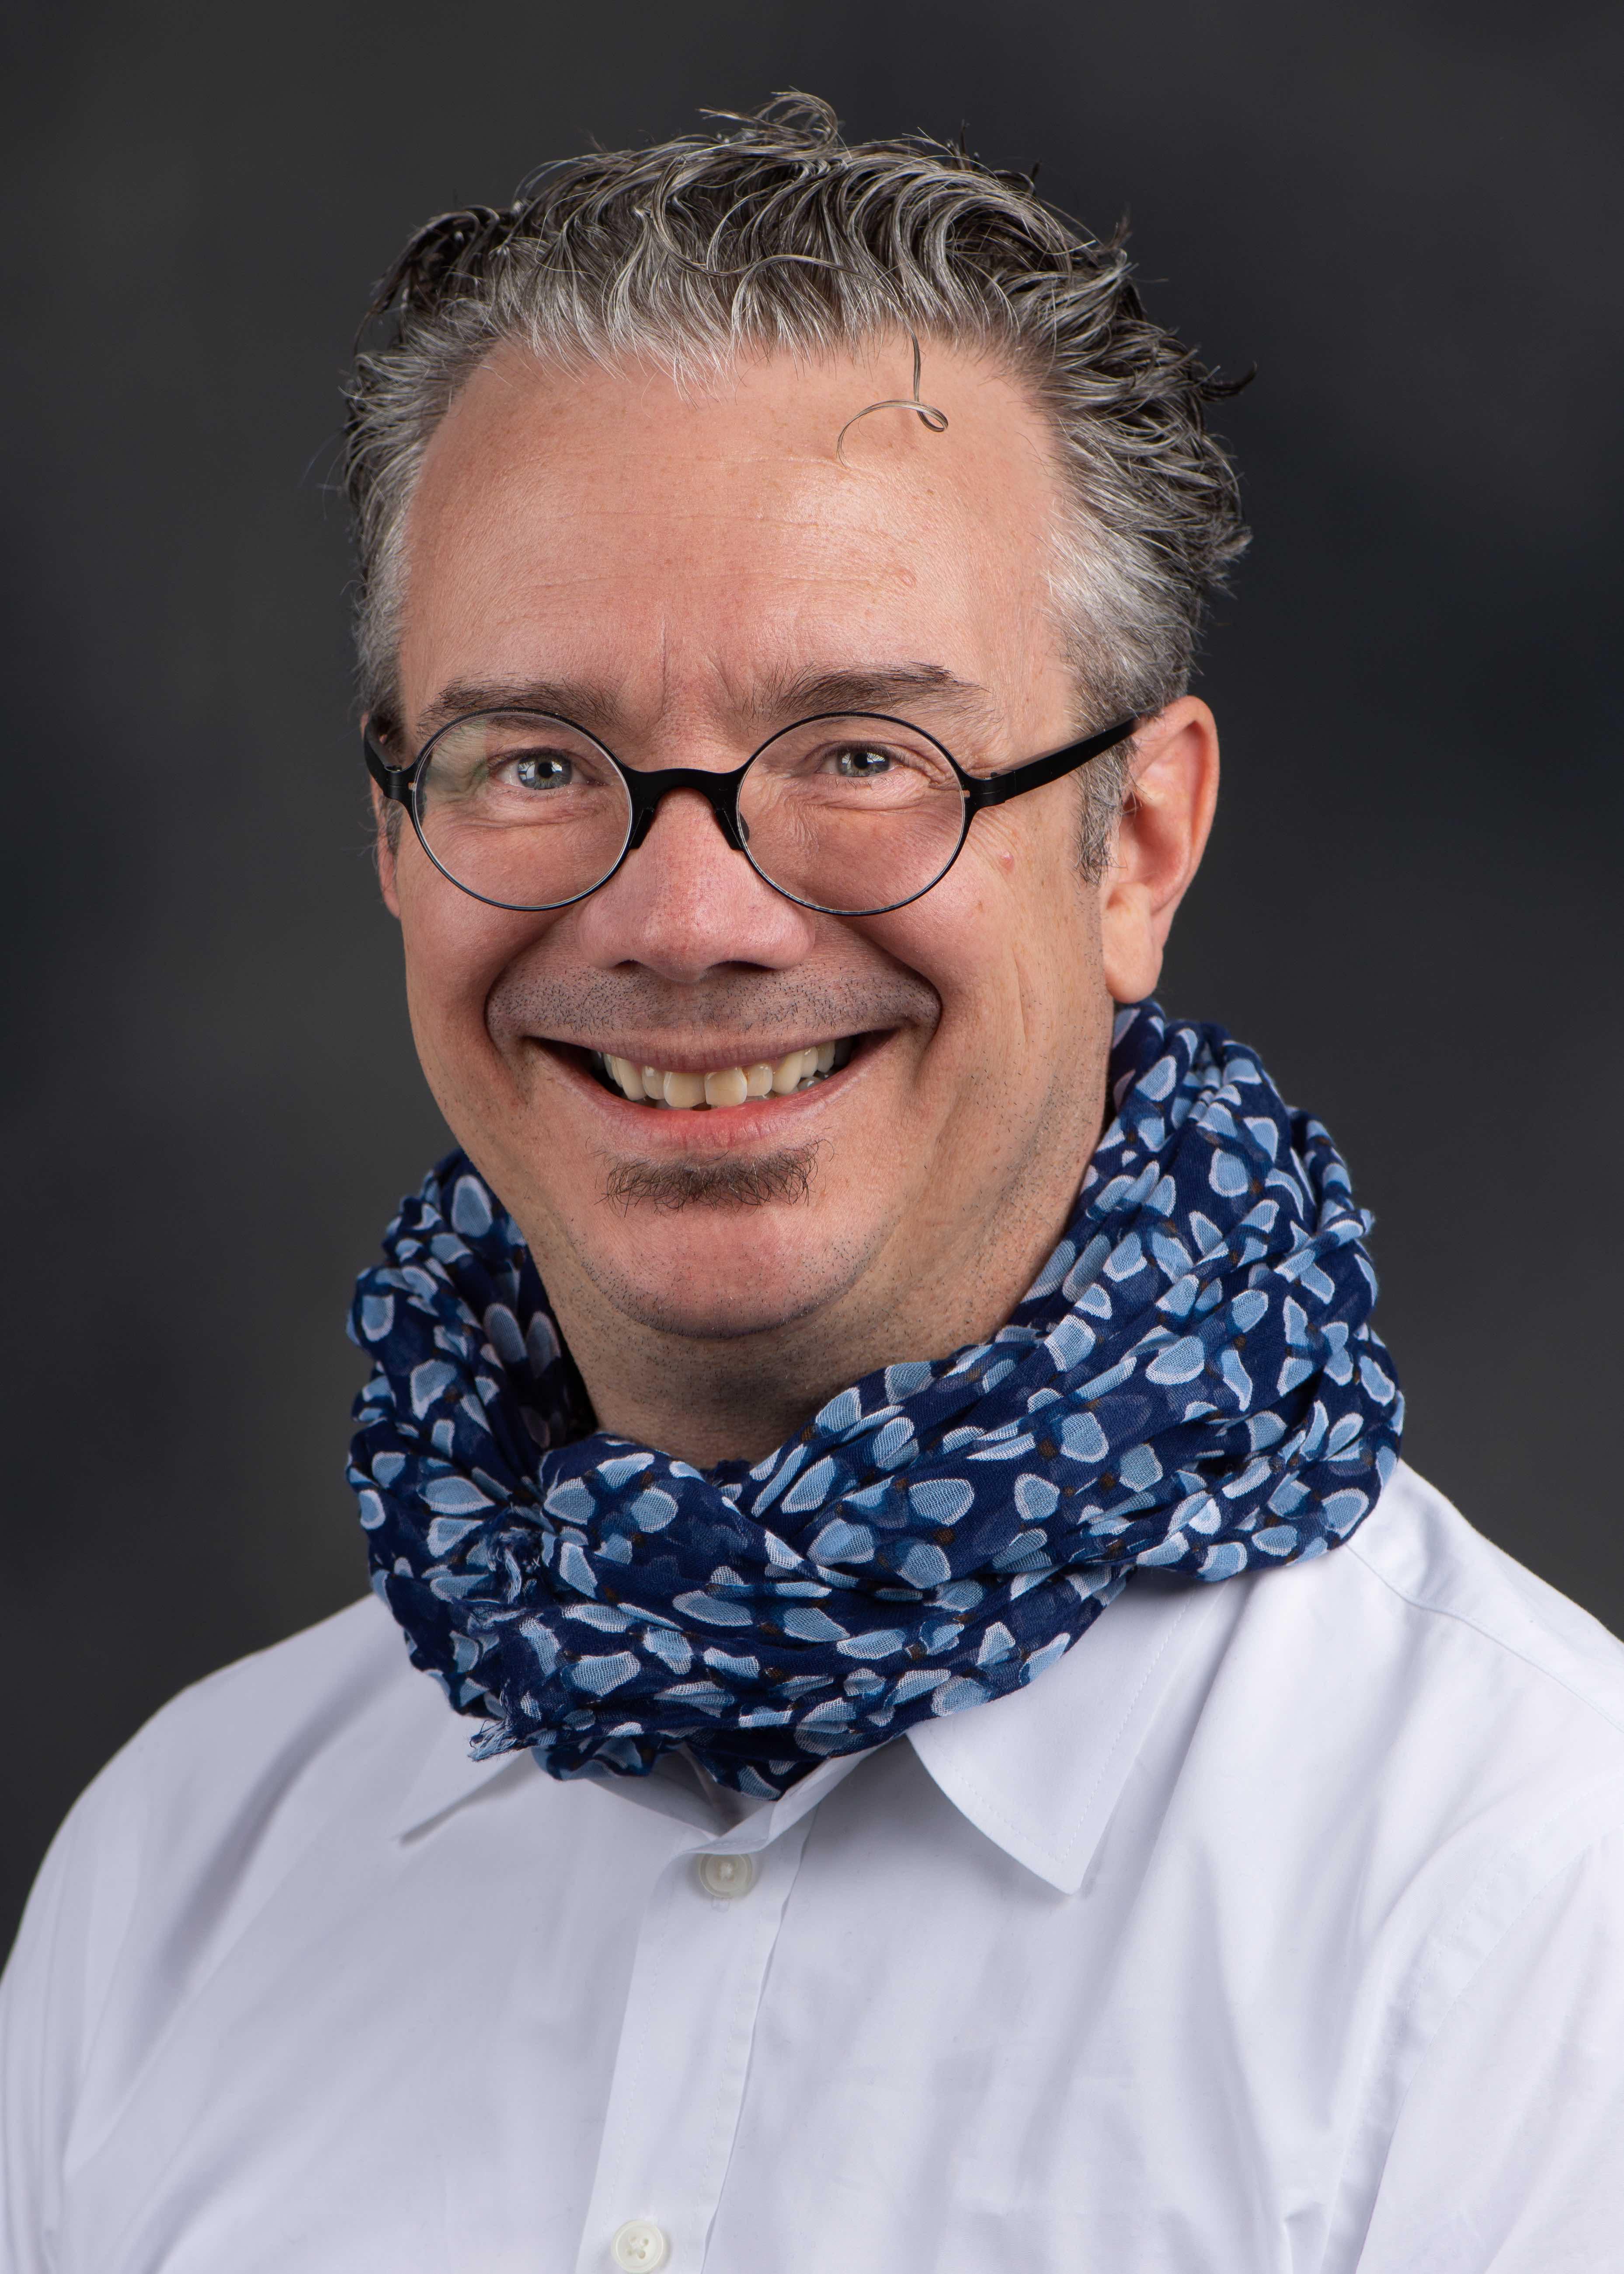 William Perrine, 2020 Distinguished Honors Faculty Award recipient